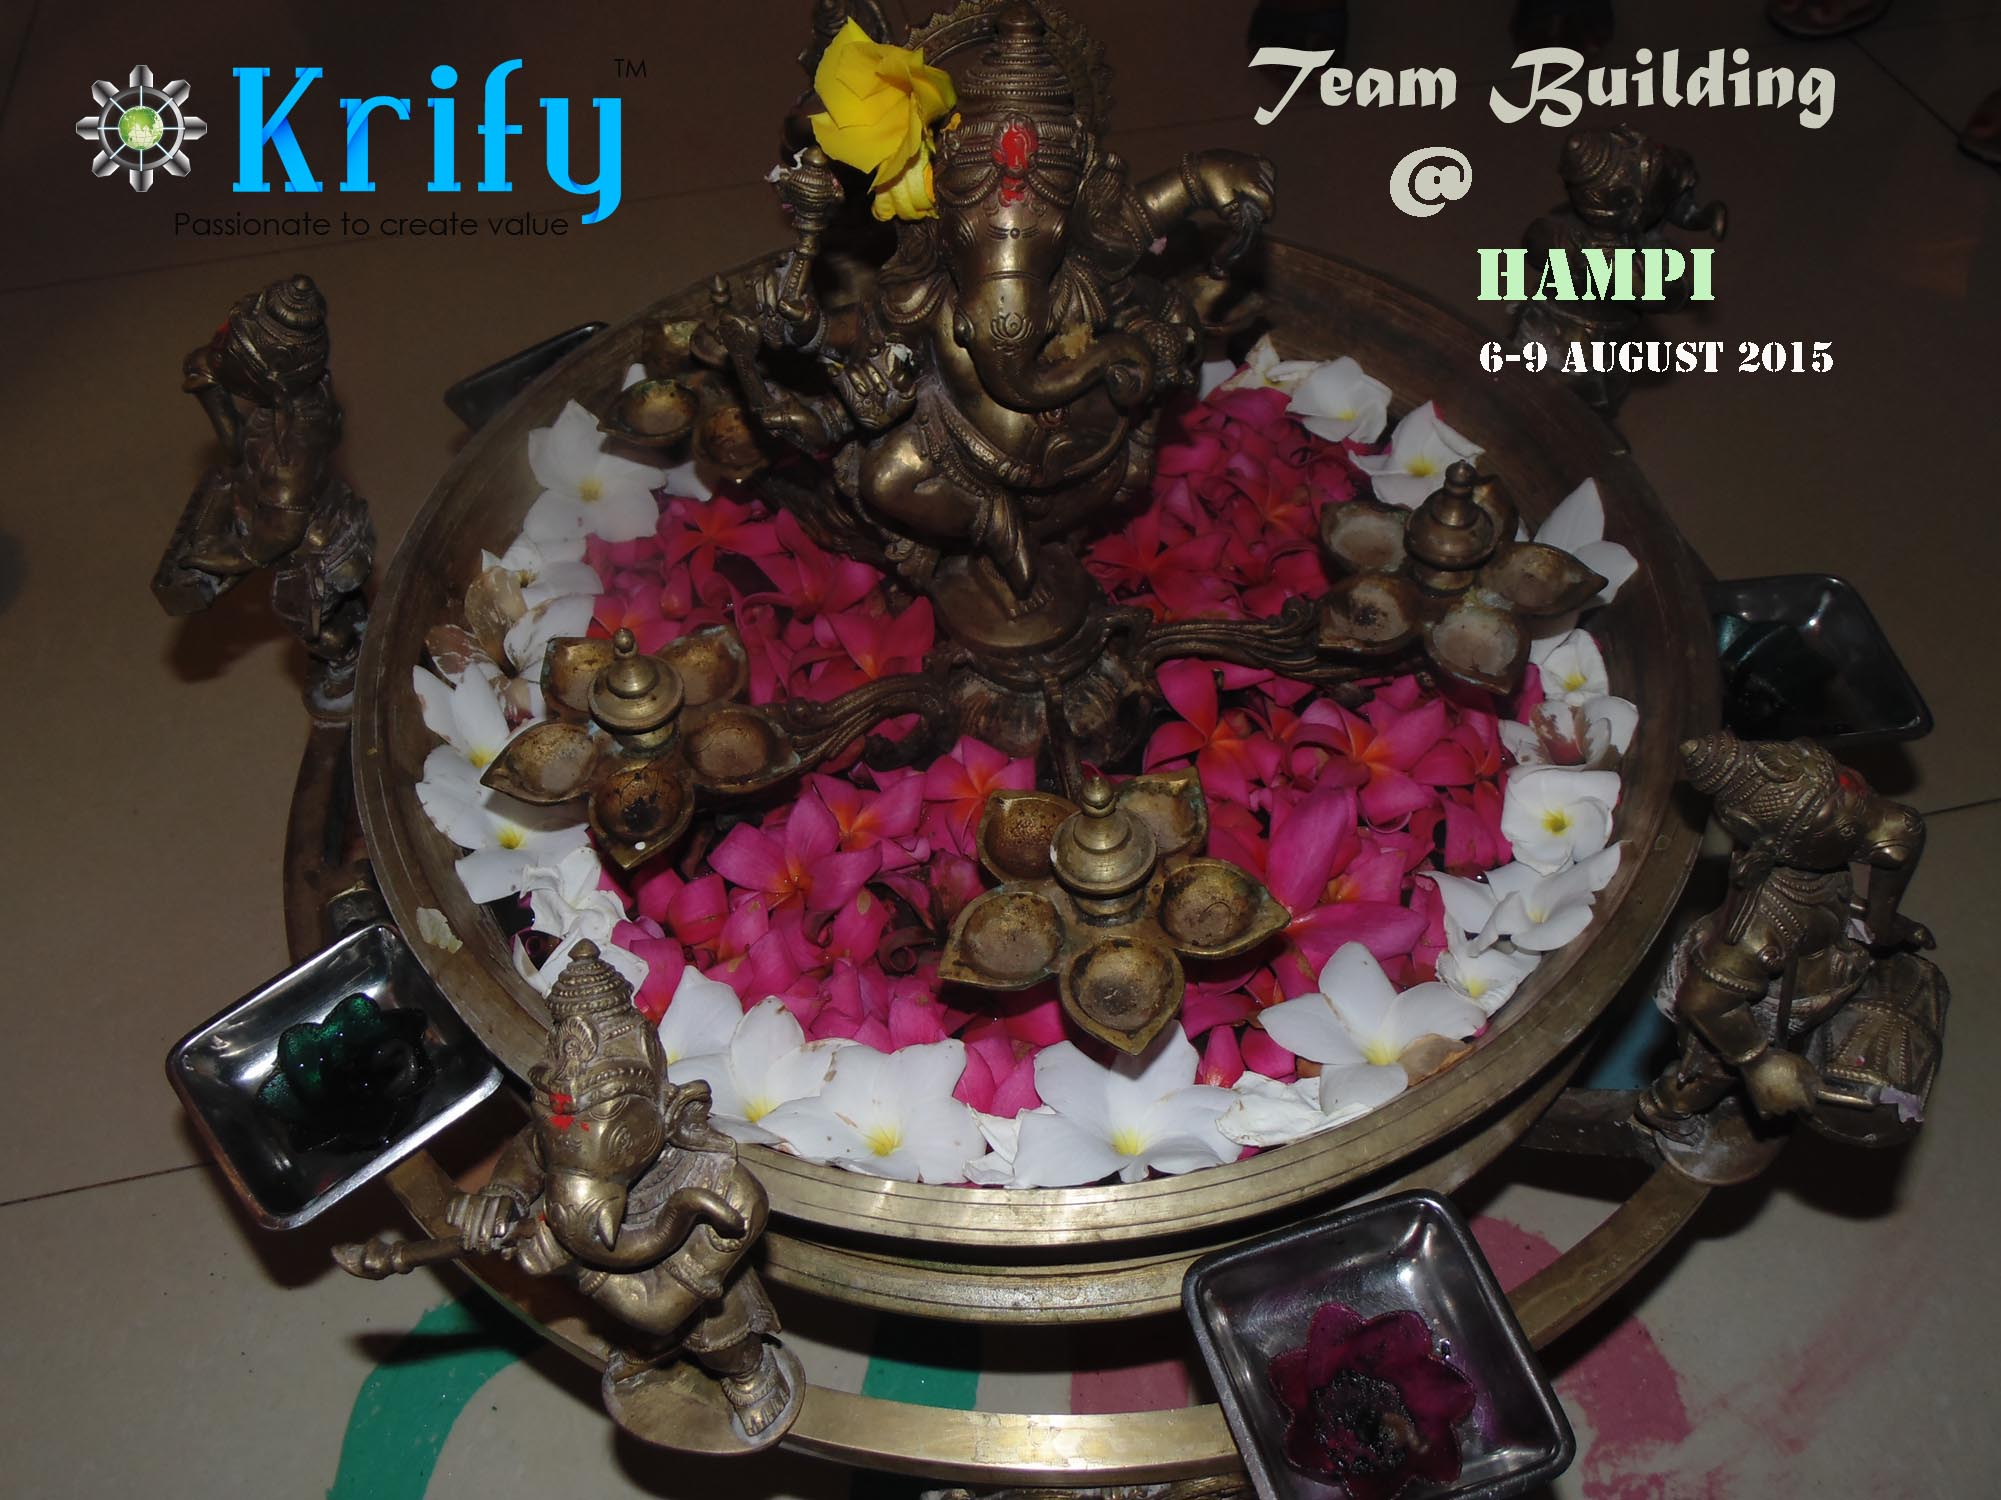 Krify Team Building